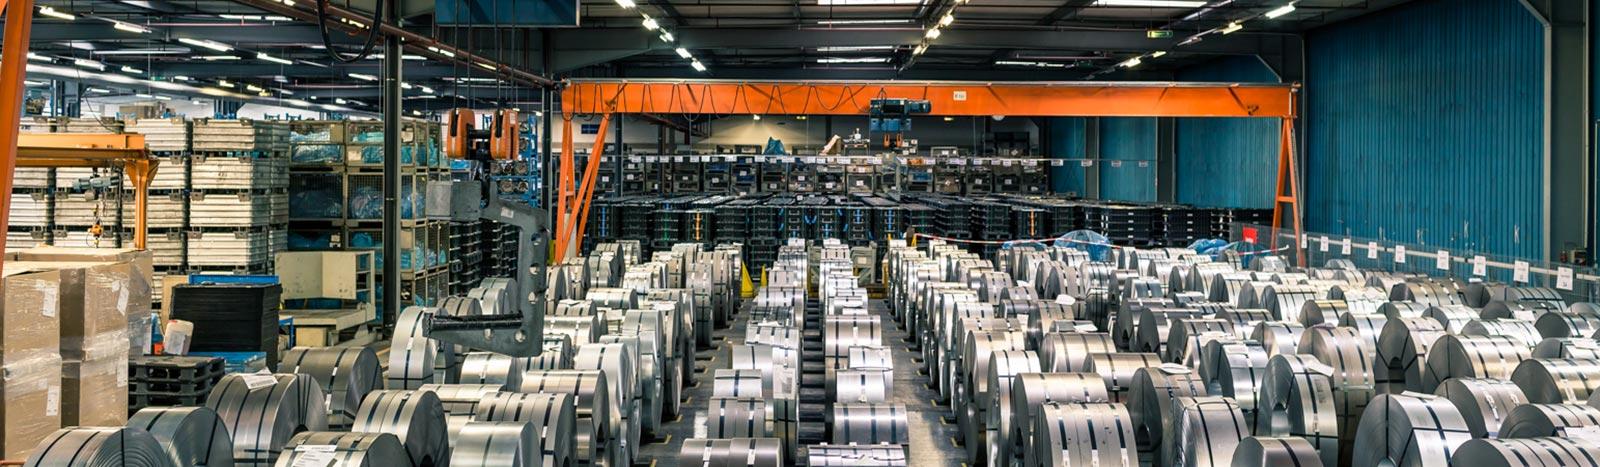 isl-logistics-modular-industrie-kl